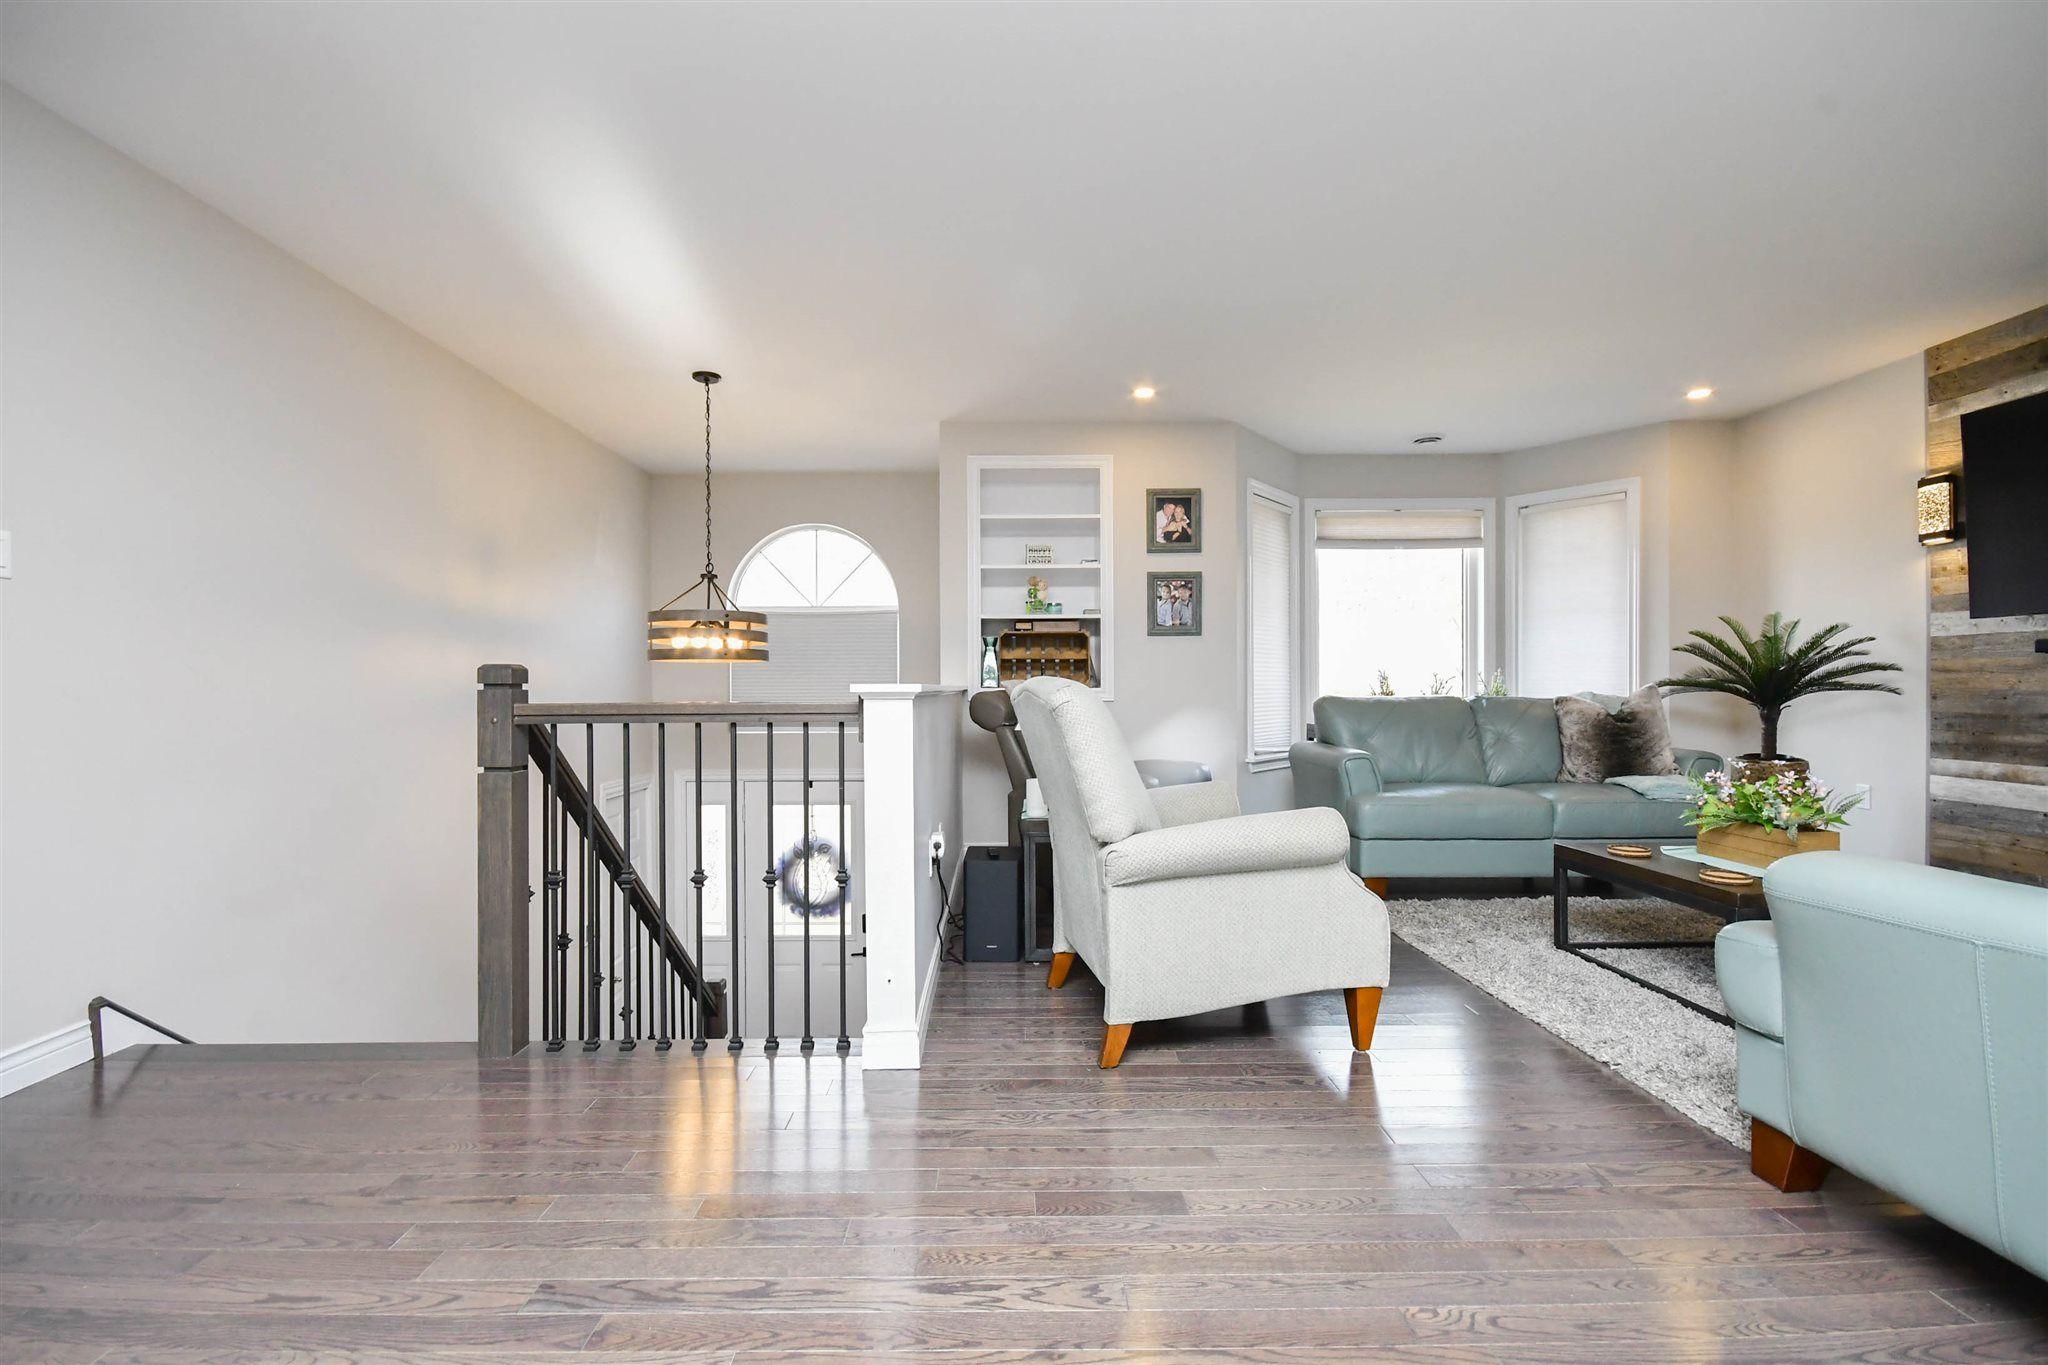 Photo 17: Photos: 17 Armstrong Court in Halifax: 5-Fairmount, Clayton Park, Rockingham Residential for sale (Halifax-Dartmouth)  : MLS®# 202105075